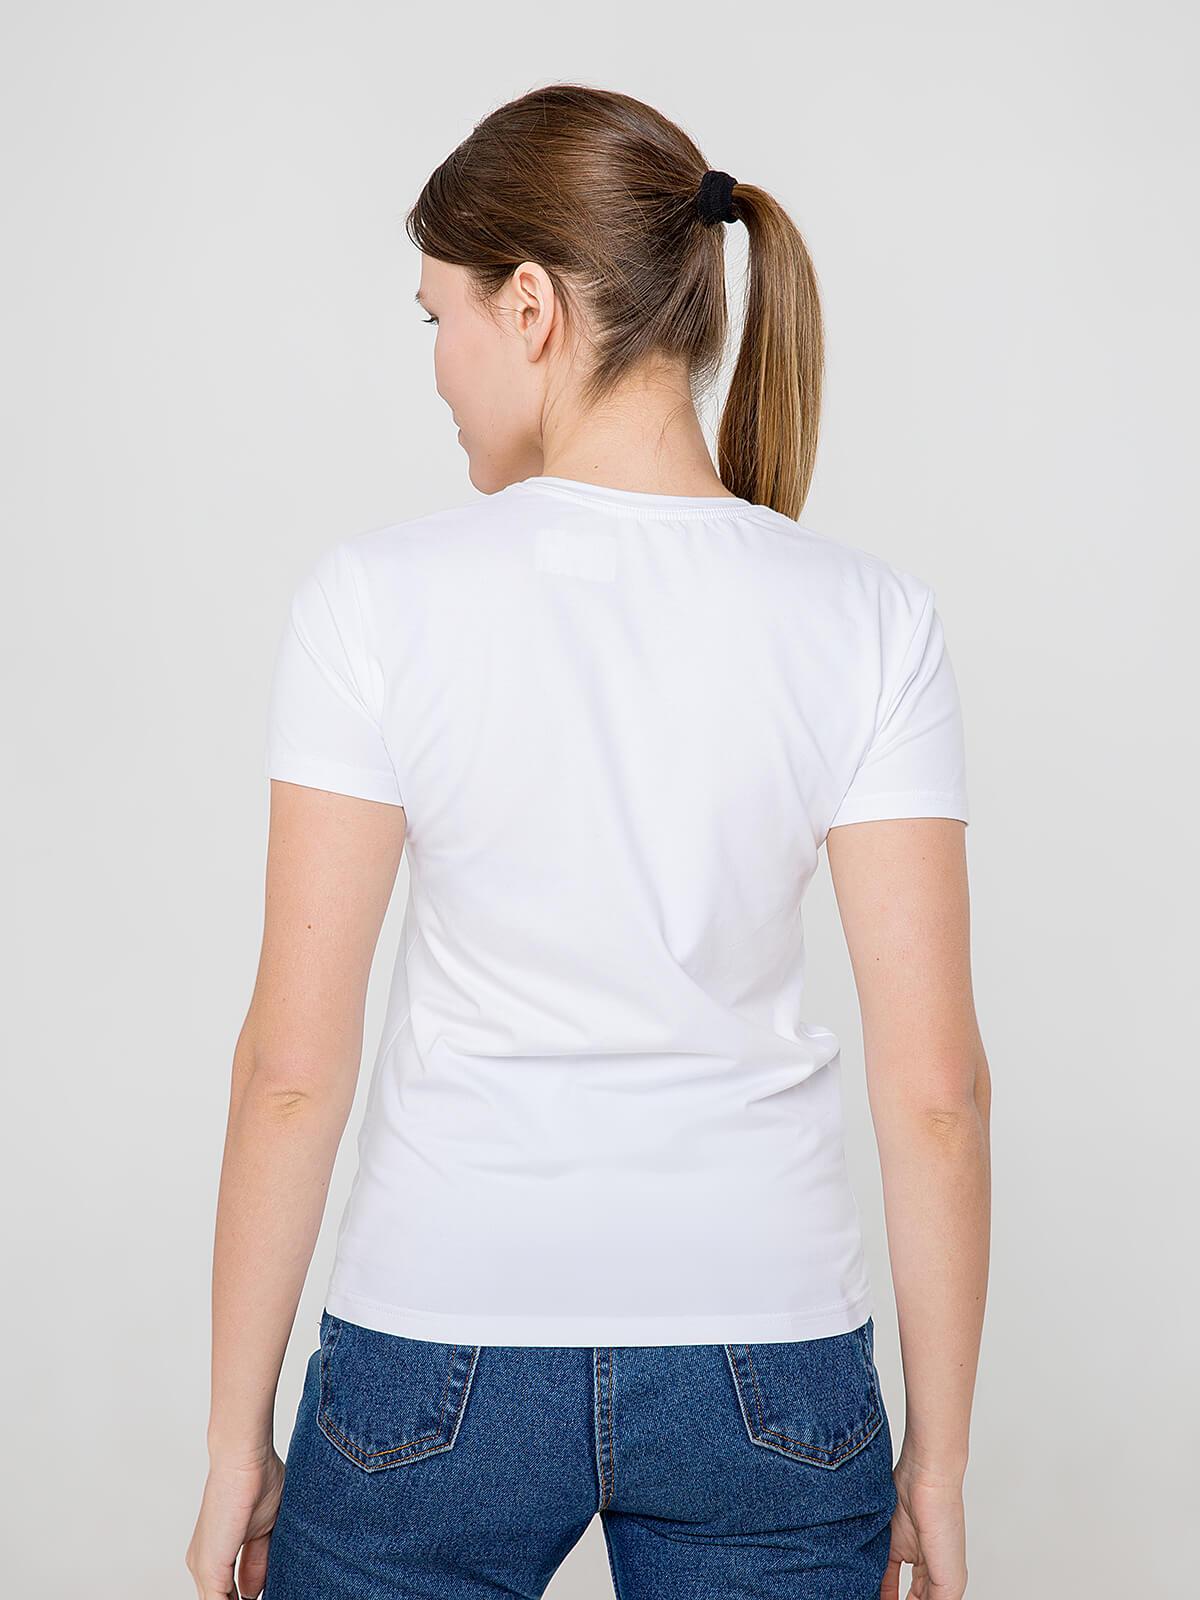 Women's T-Shirt Eagle. Color білий.  Матеріал: 95% бавовна, 5% спандекс.